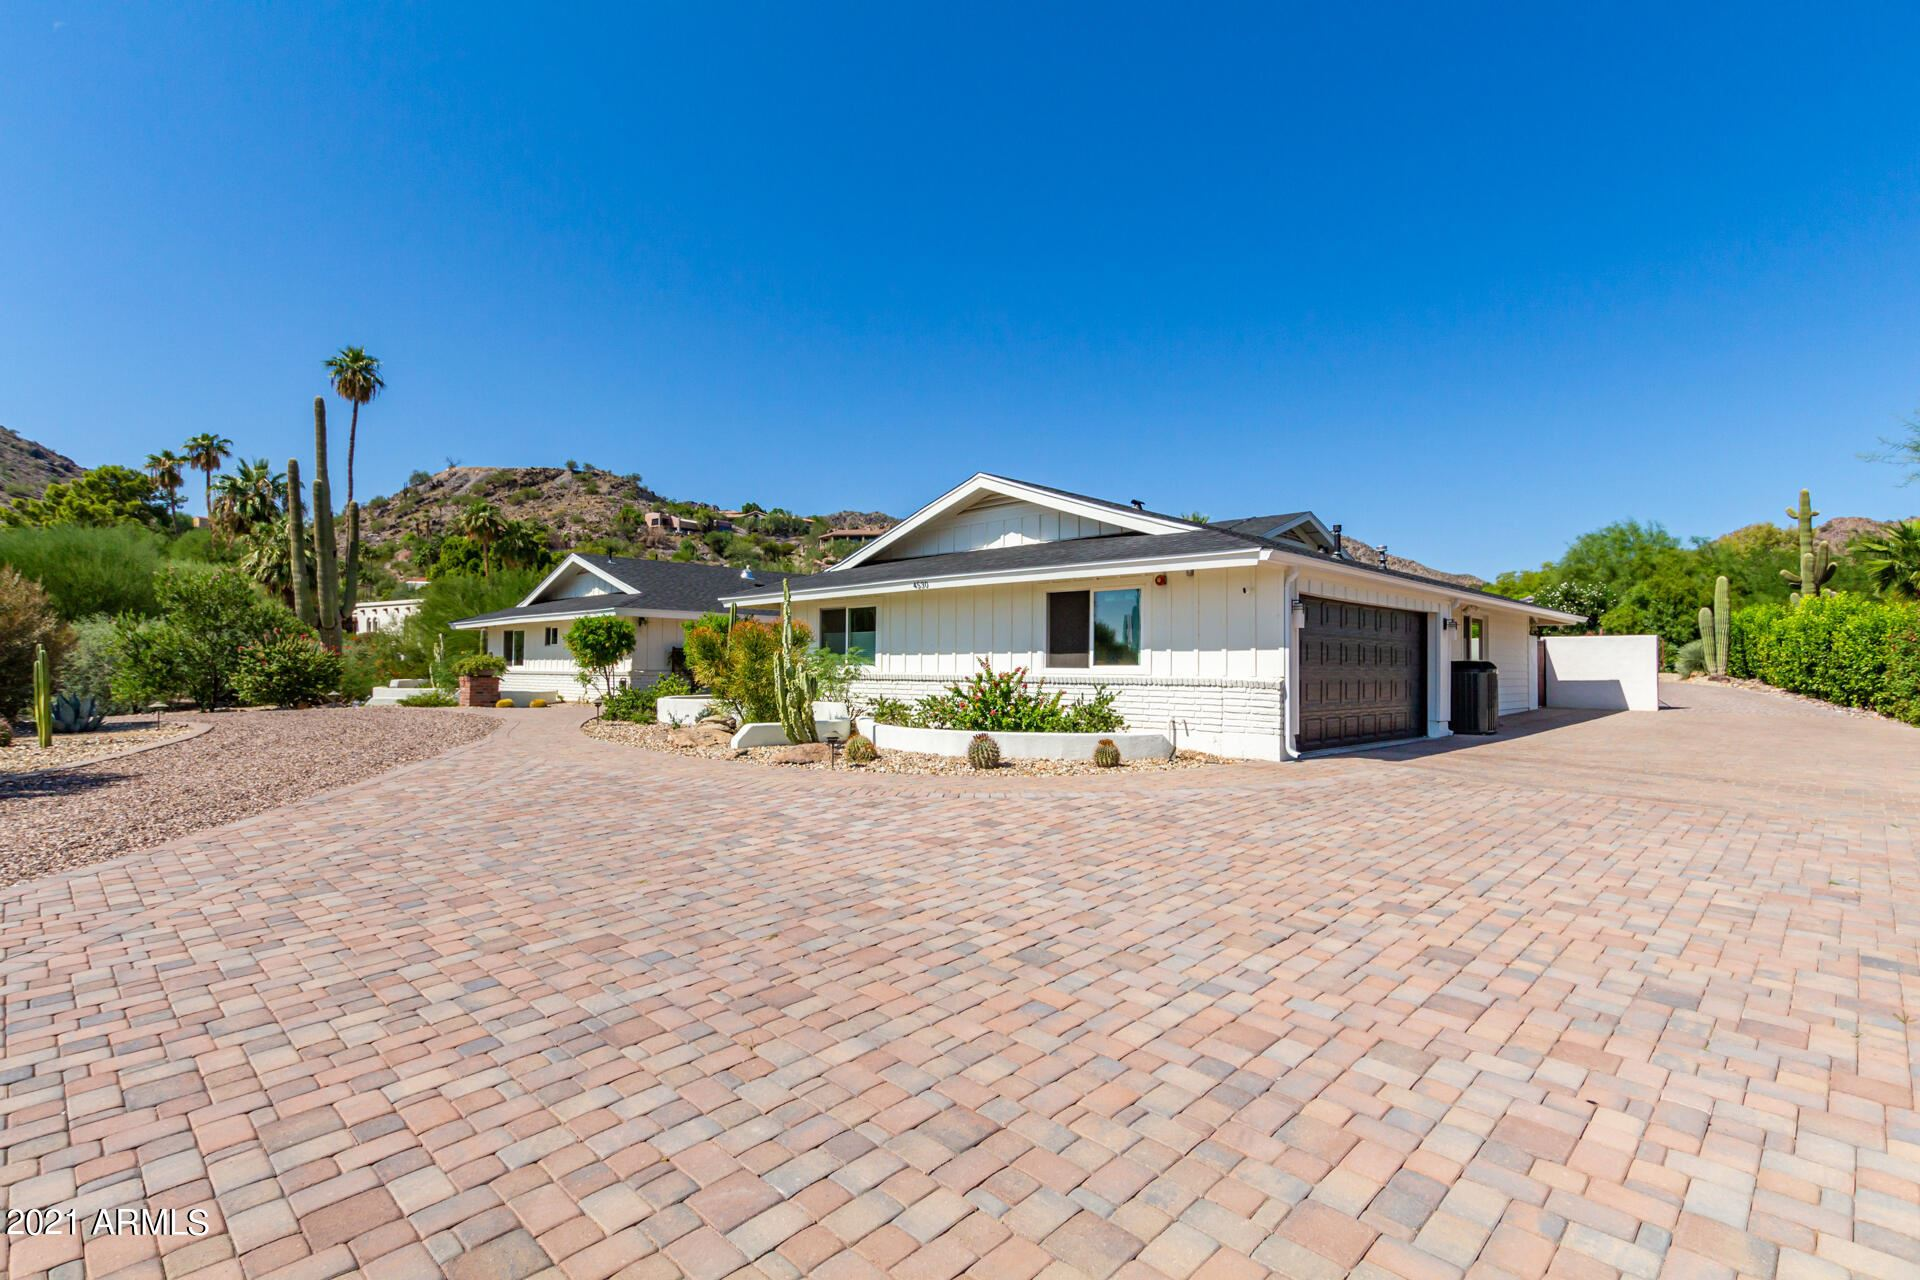 Photo of 4530 E INDIAN BEND Road, Paradise Valley, AZ 85253 (MLS # 6303363)